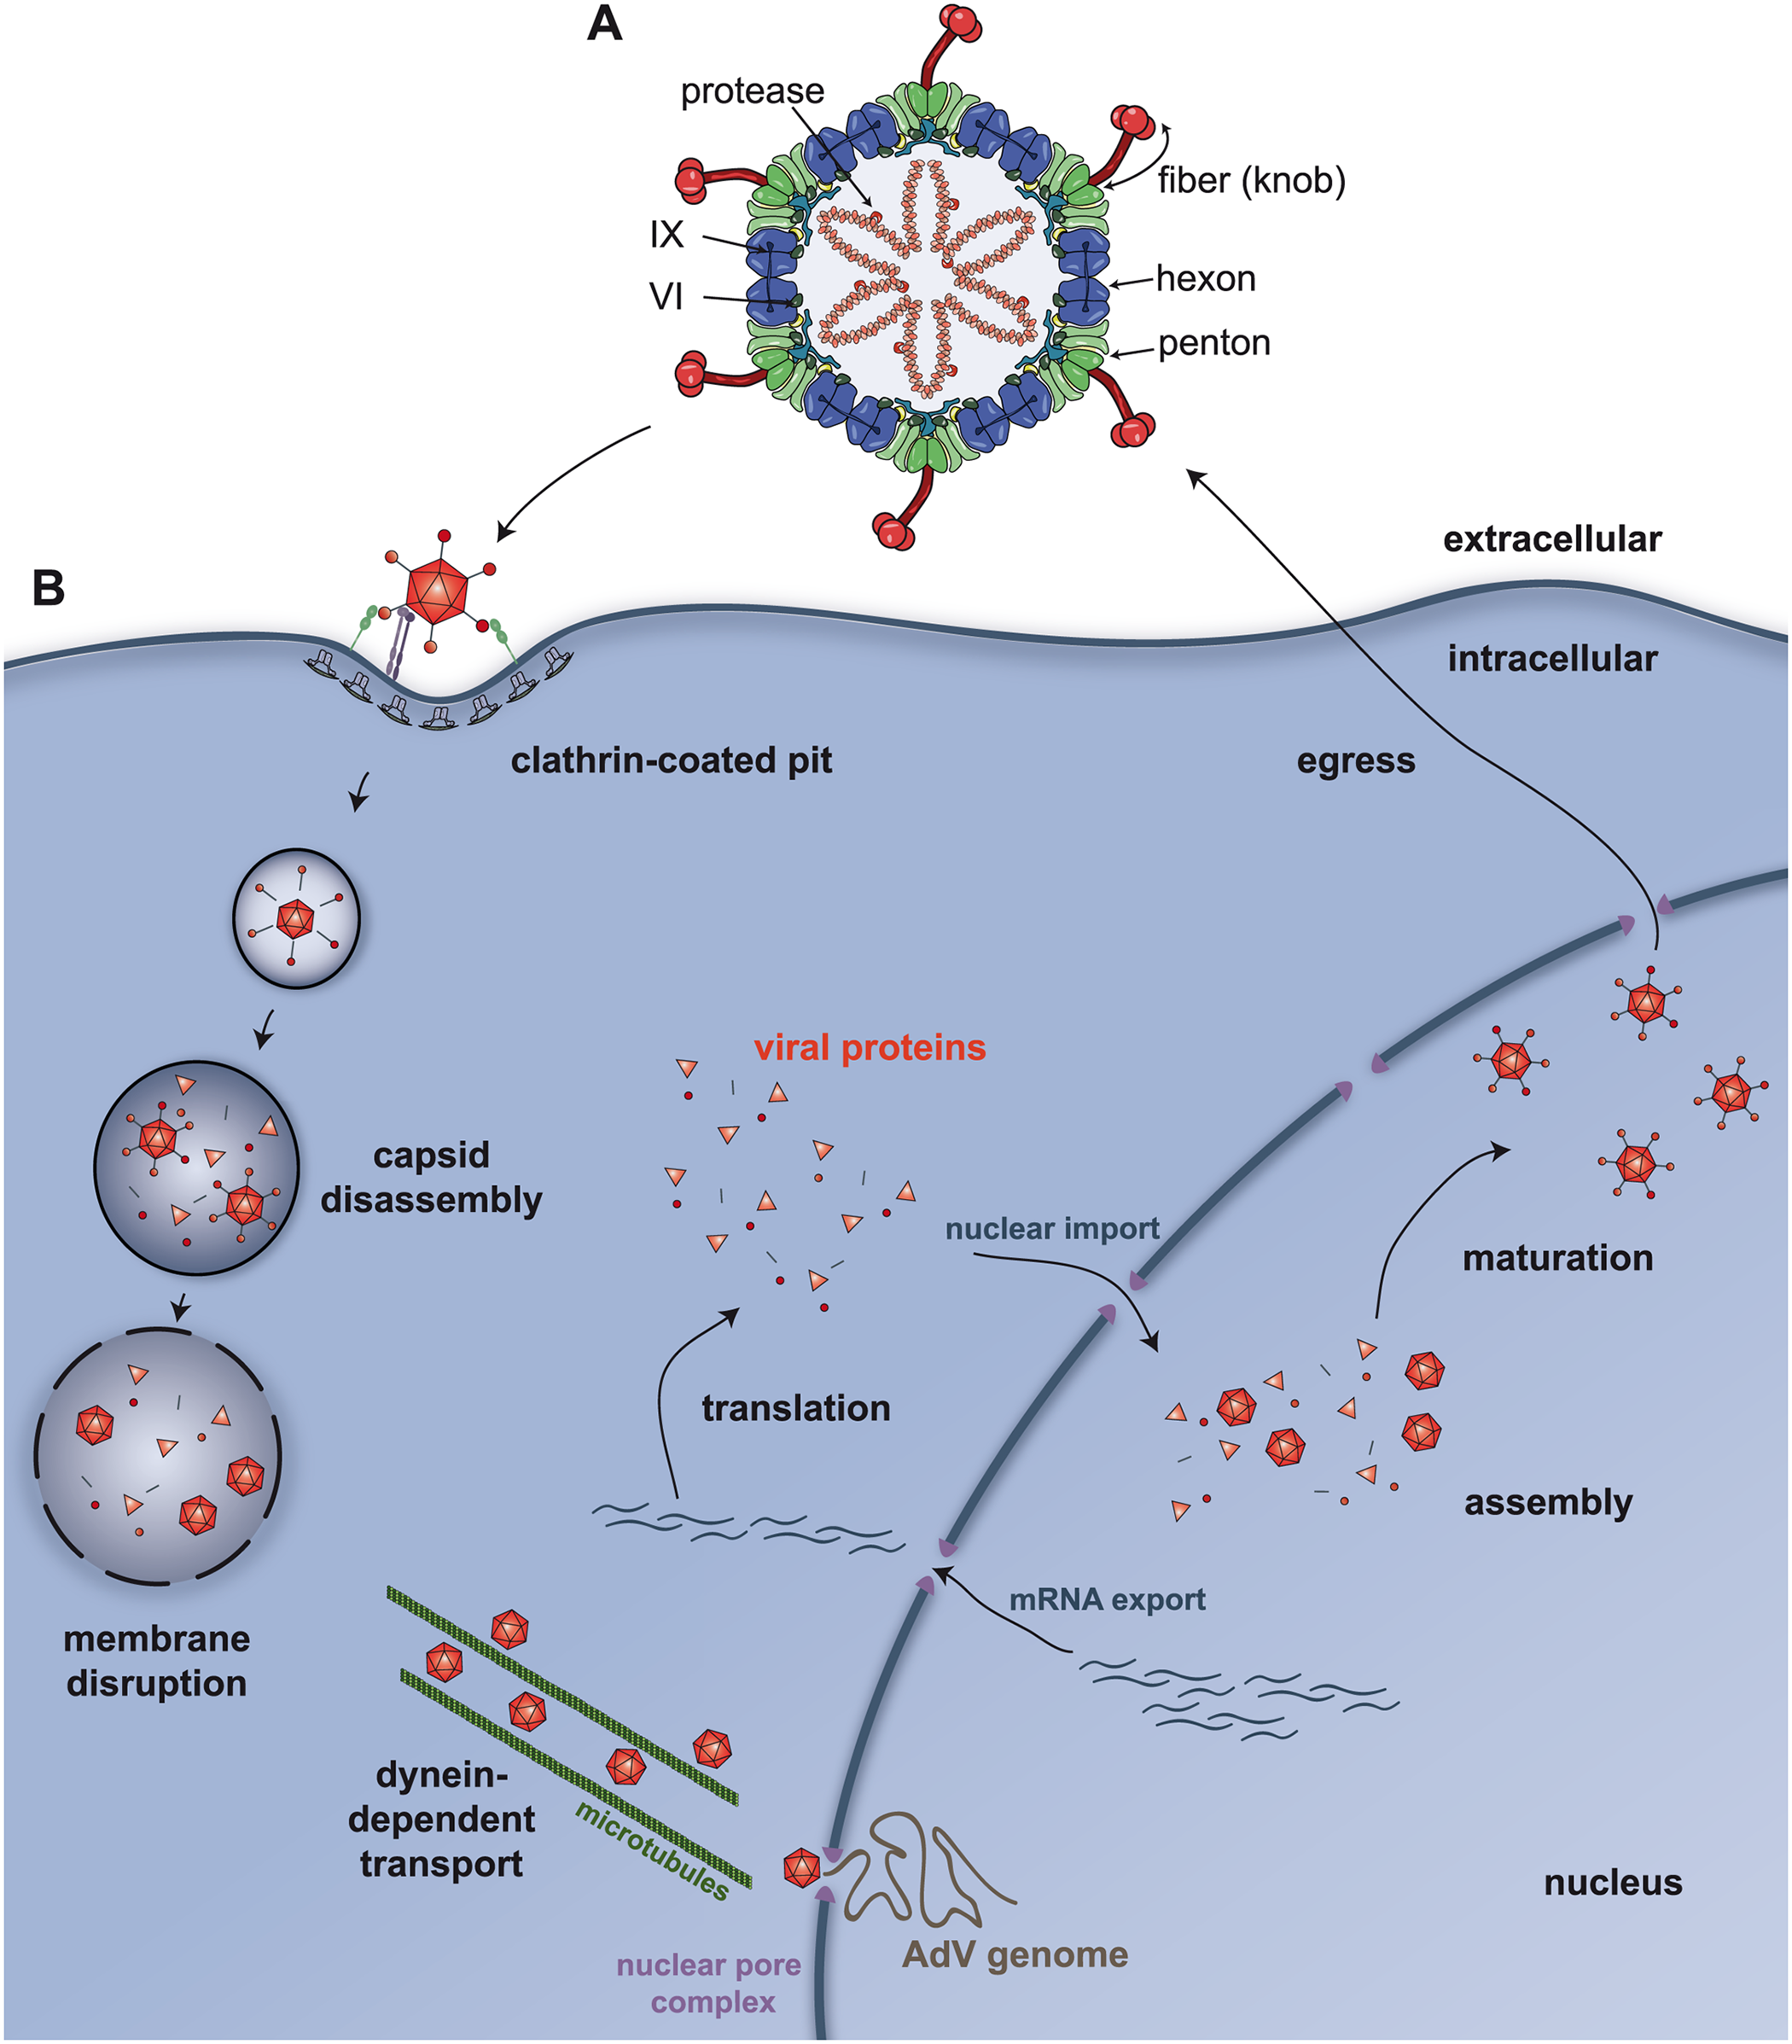 Adenovirus structure and trafficking.